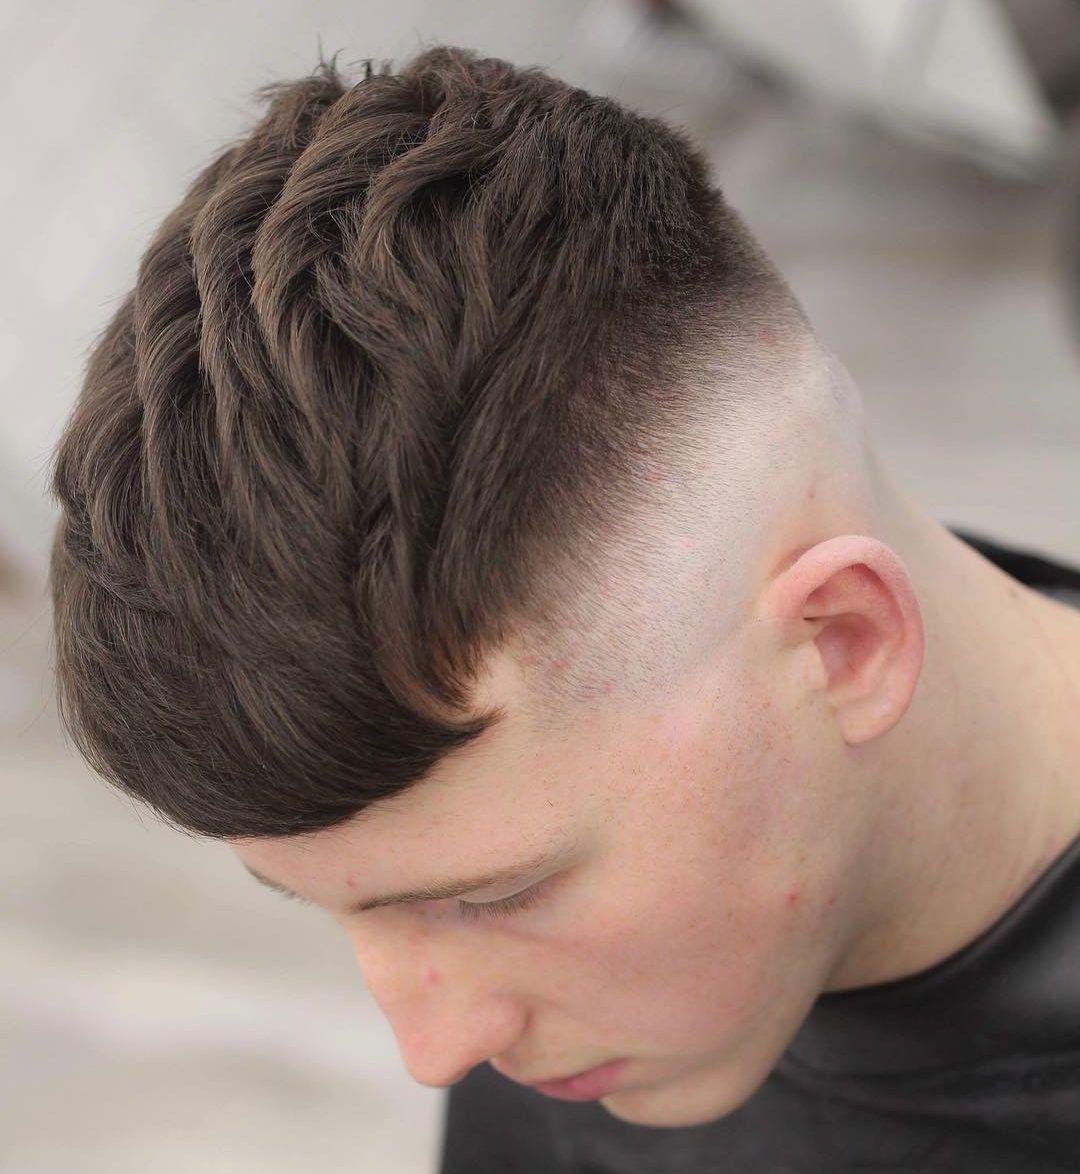 25 Short Hairstyles for Men (Best Of List) | Coiffure et ...